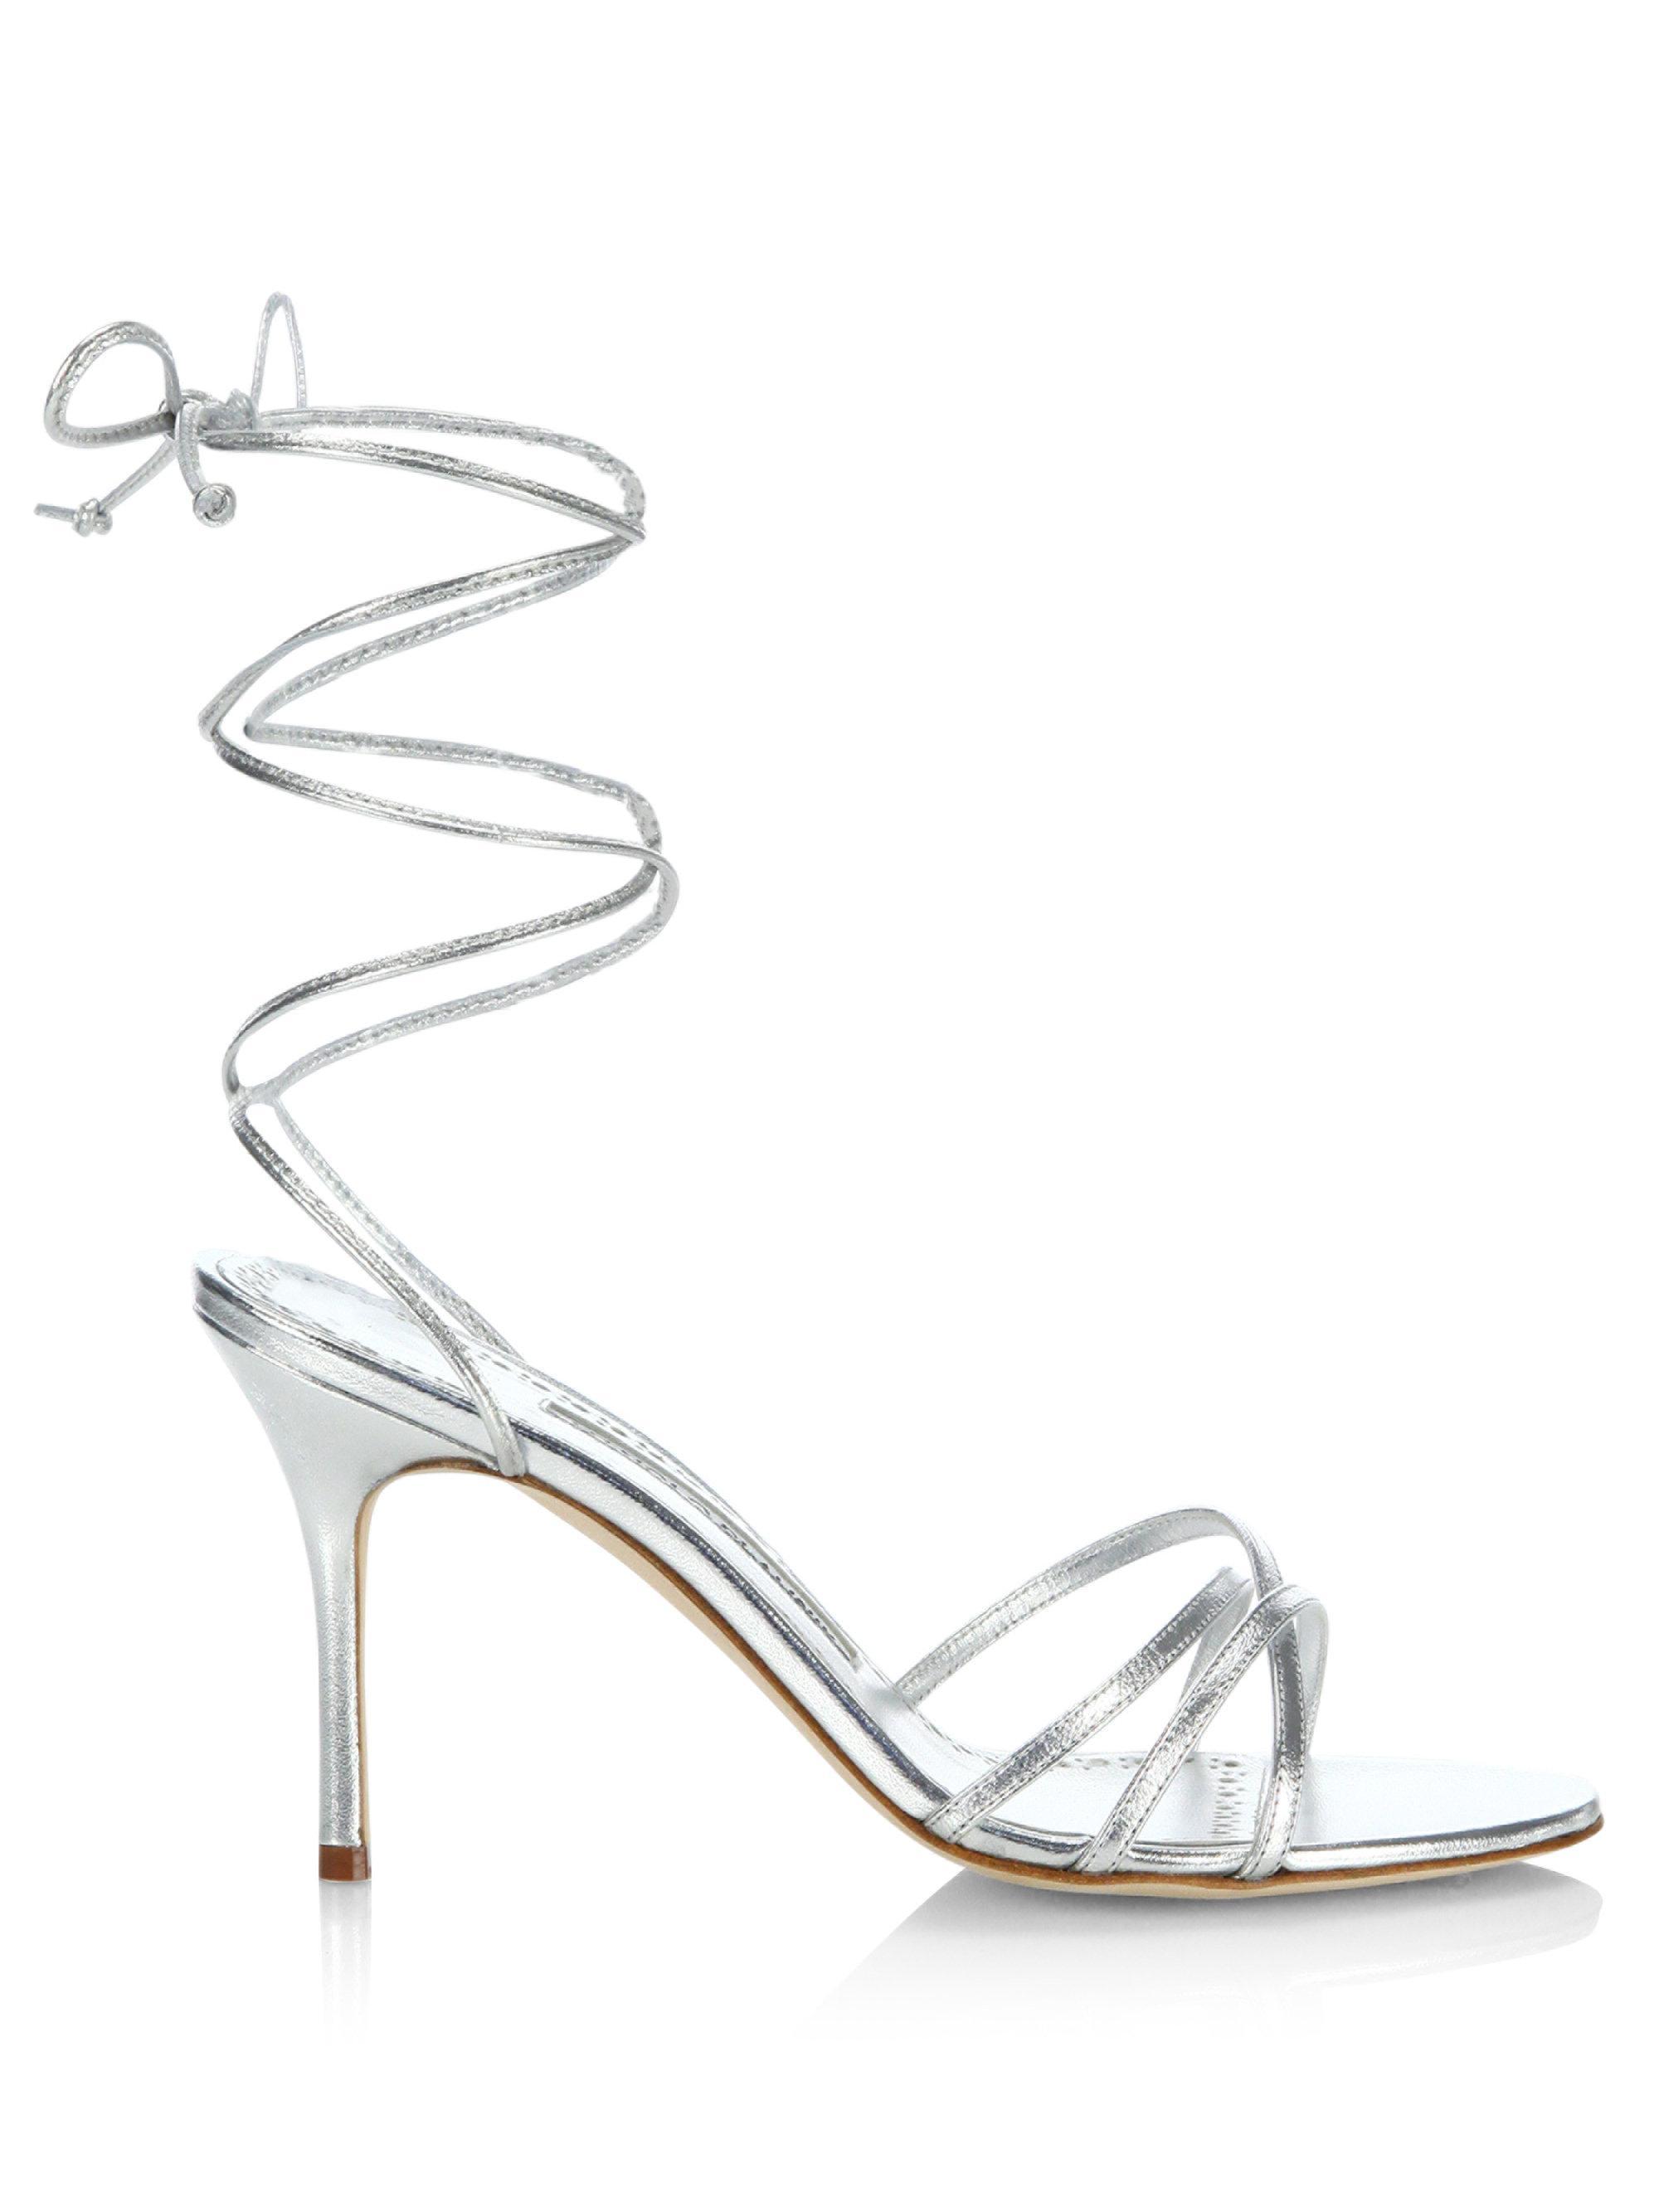 c9a39aca1b Manolo Blahnik Leva 90 Metallic Leather Ankle-wrap Sandals in ...